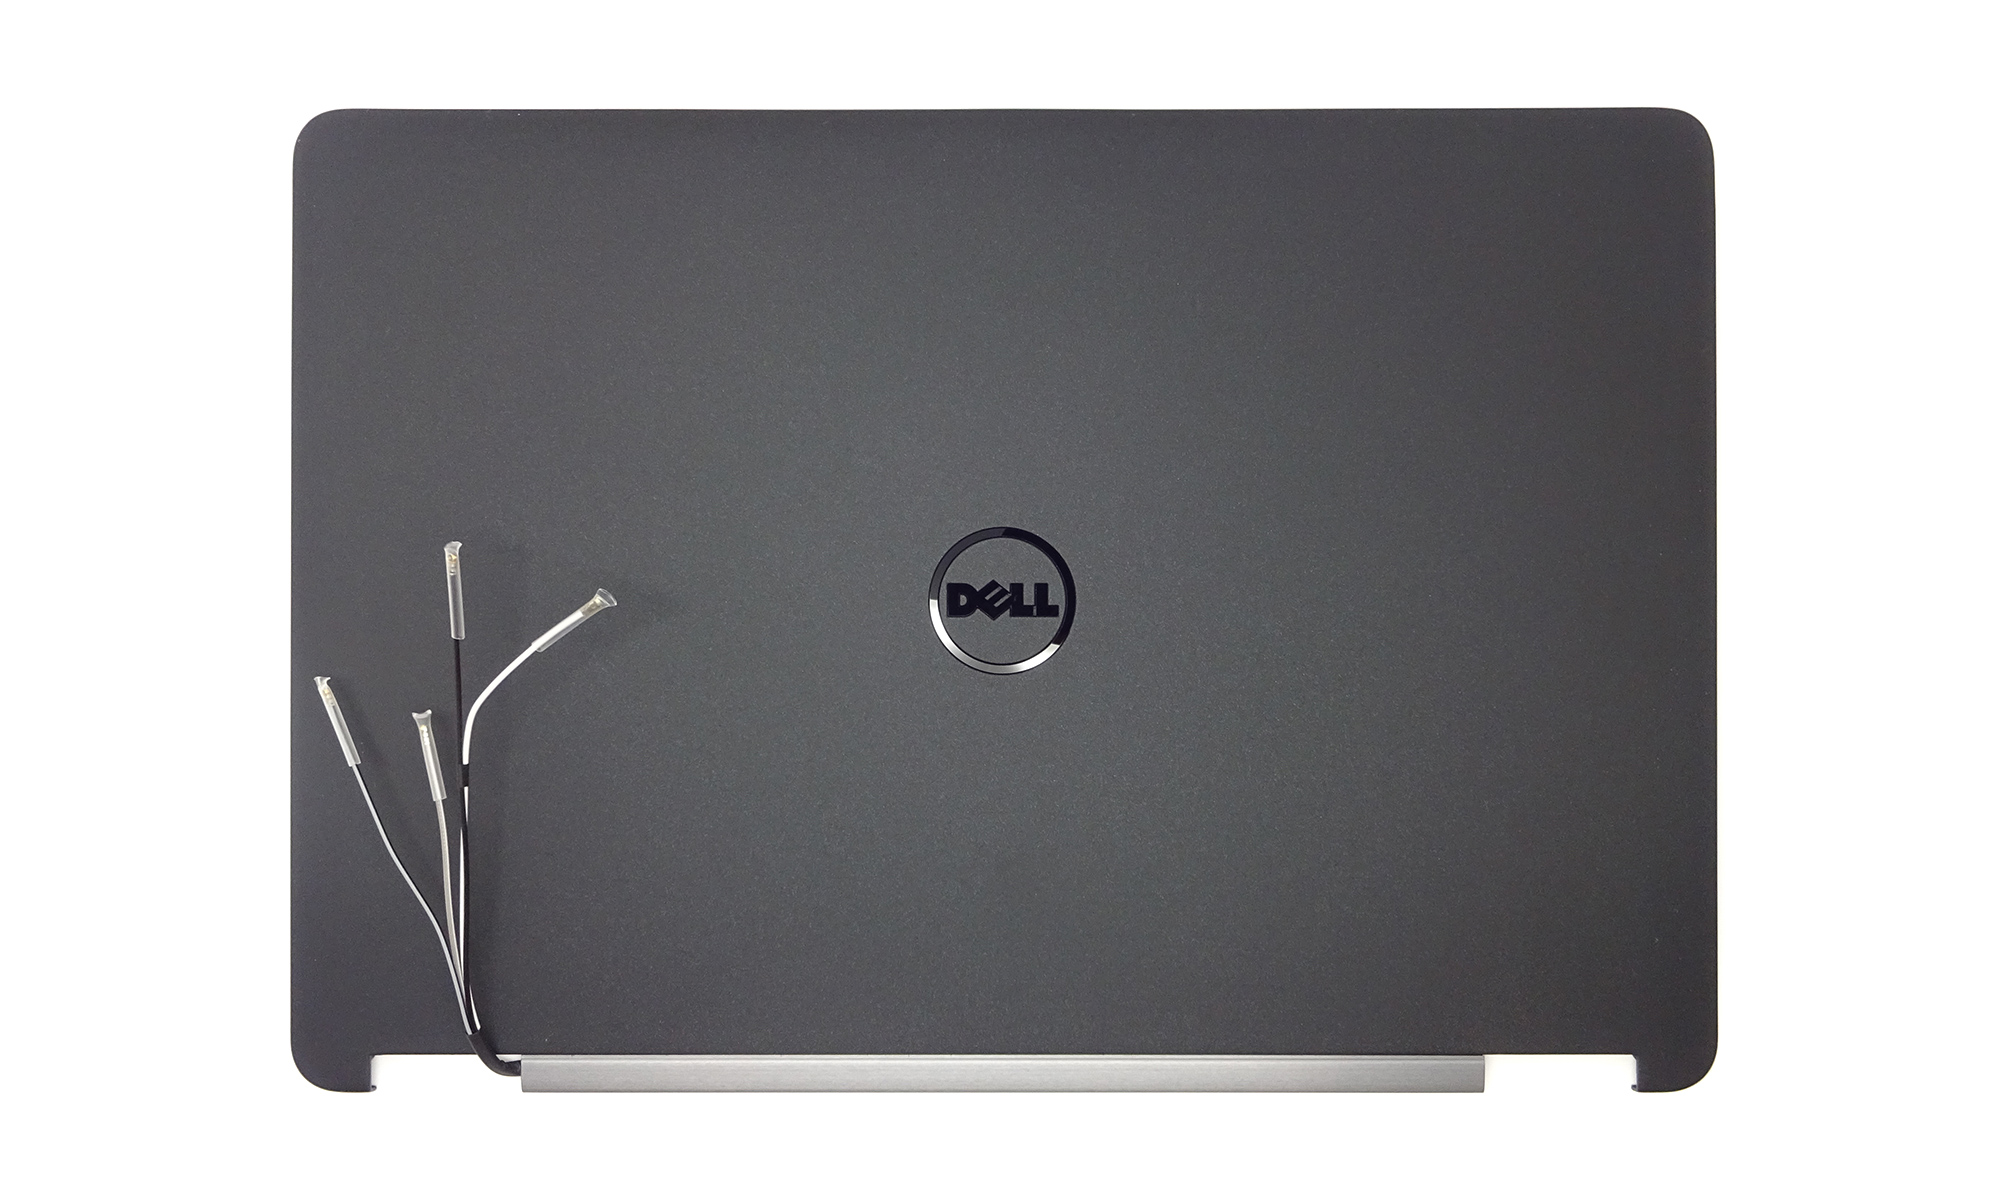 Capac display original Dell Latitude E7270 echipat cu display fara touchscreen, negru, model 5G9NG